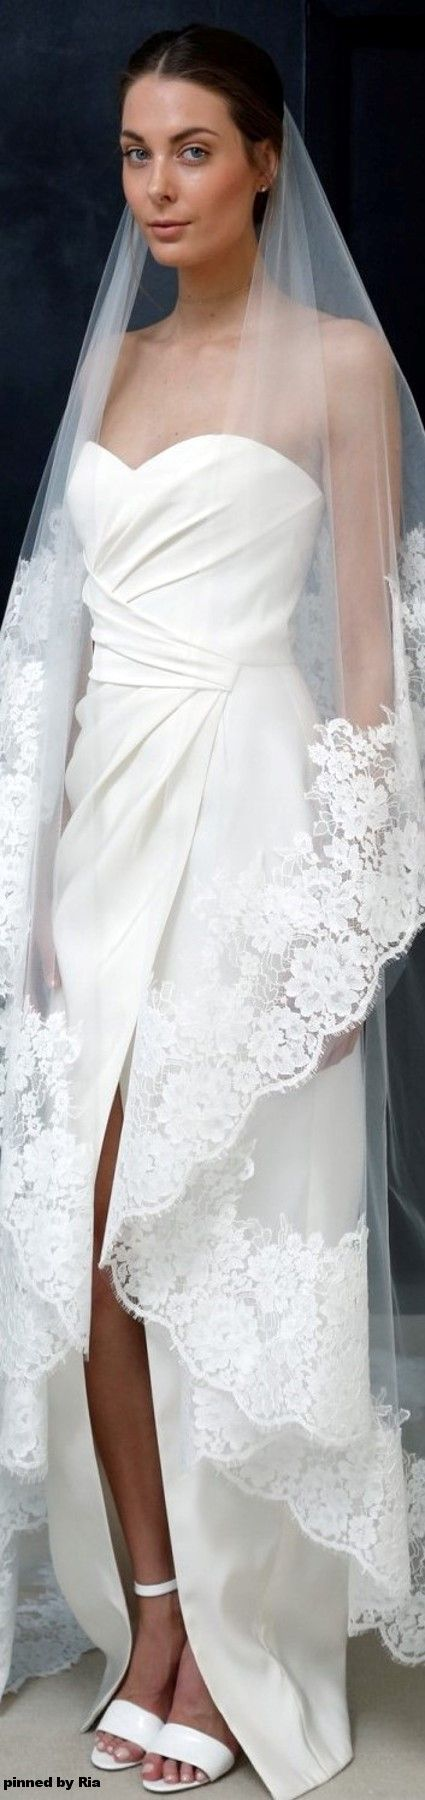 J Mendel Bridal Spring 2017 l Ria Oh my! The train definitely elevates an already elegant gown.